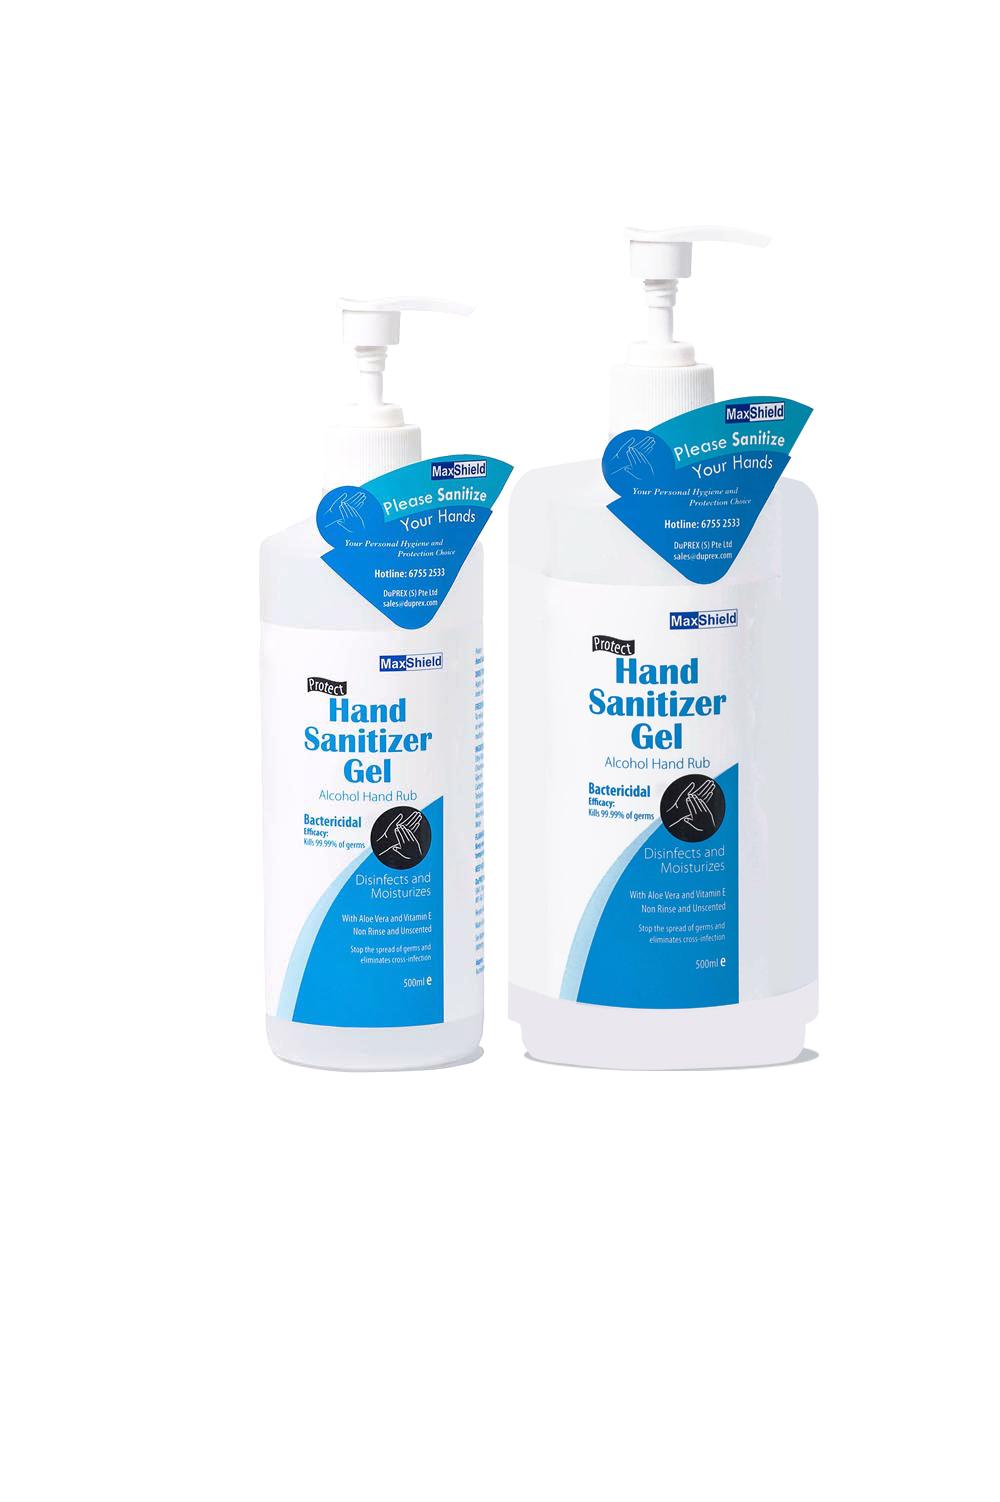 MaxShield - Hand Sanitizer Gel Alcohol Hand Rub - Duprex Singapore